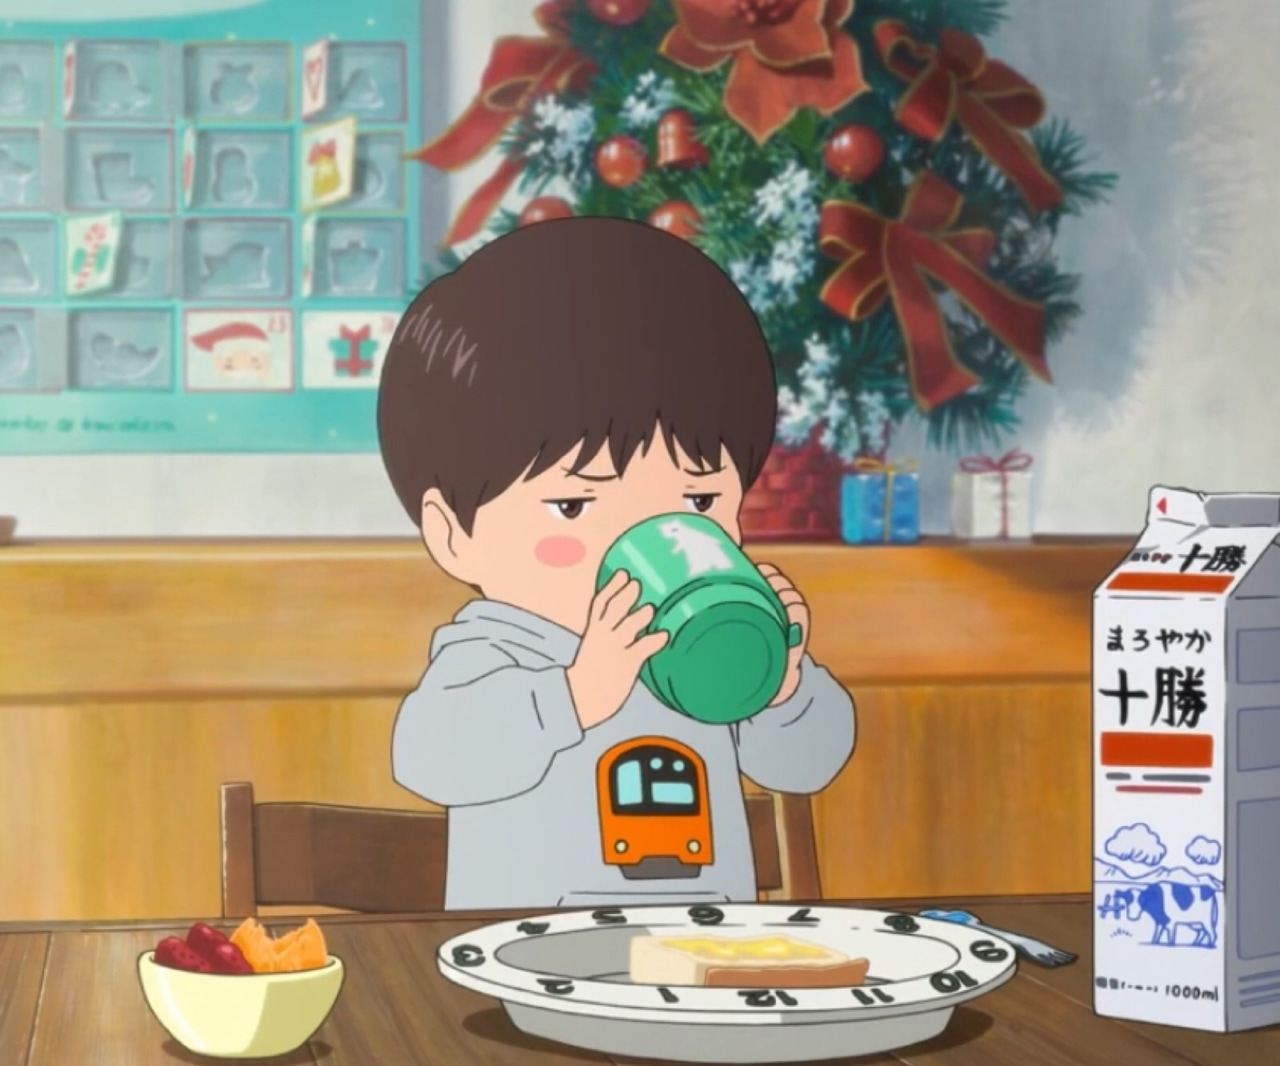 anime, cartoon, and sips tea image